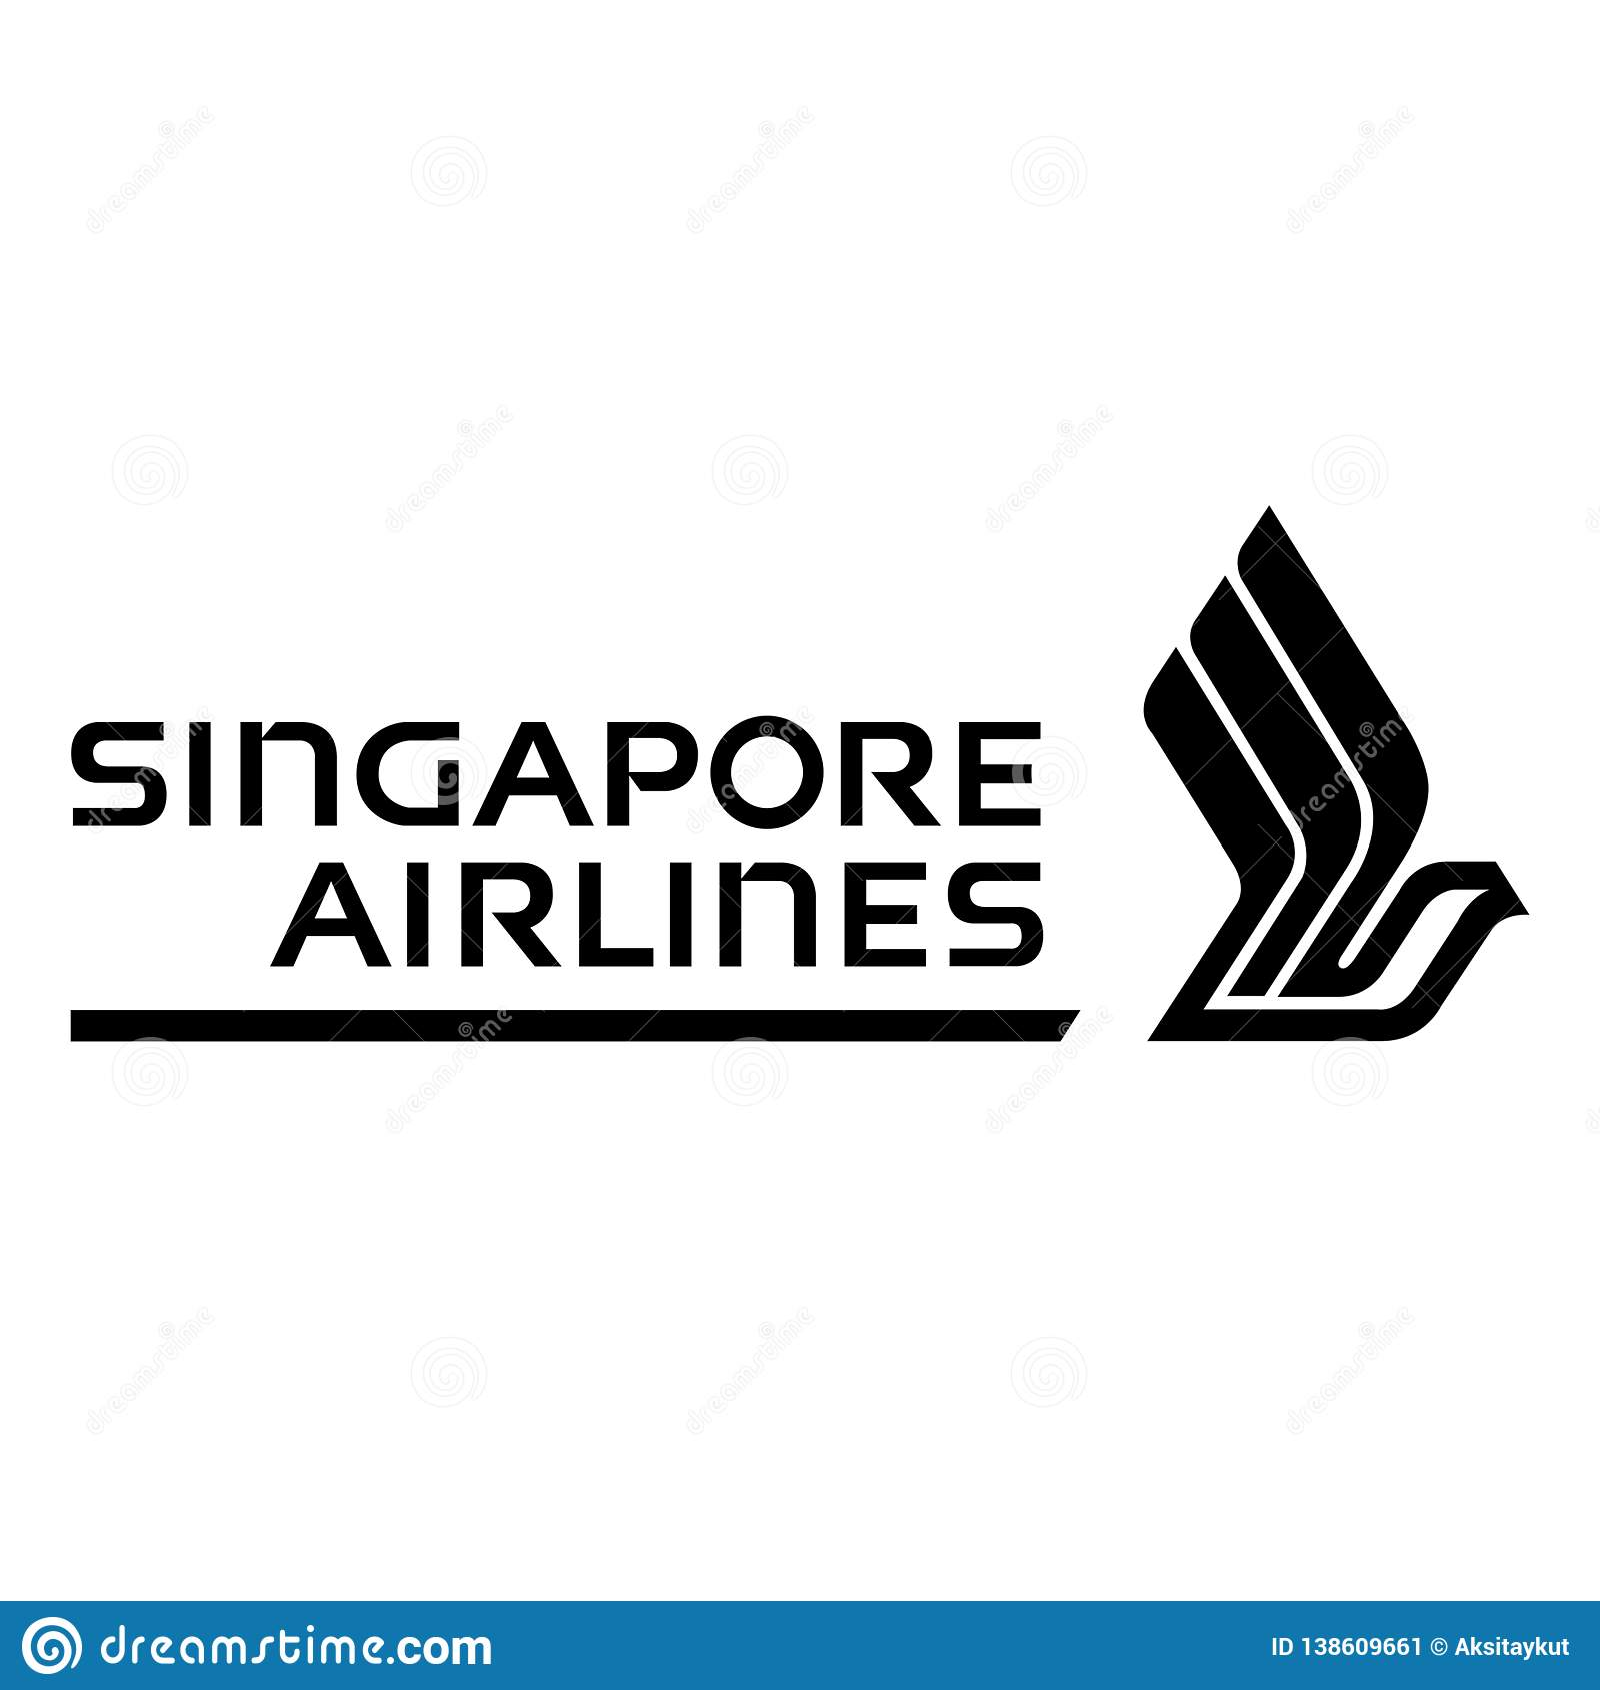 Singapore Airlines logosymbol